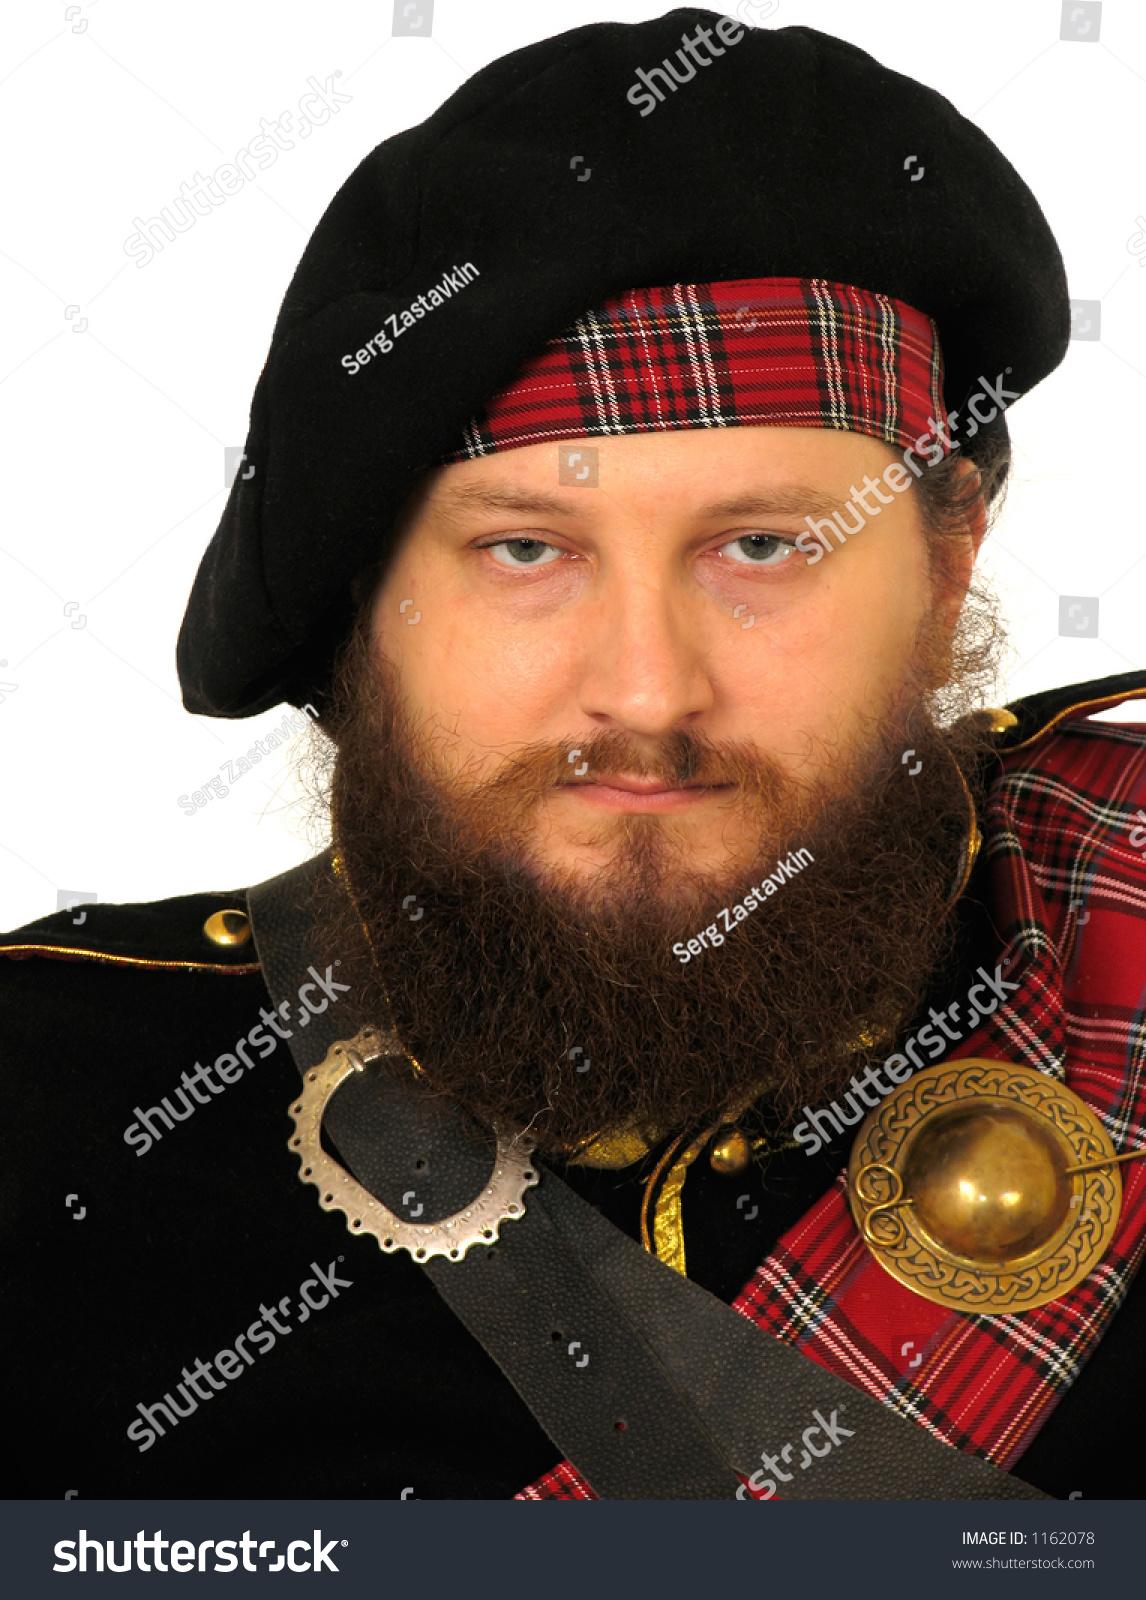 Hooker for Warrior uniform are